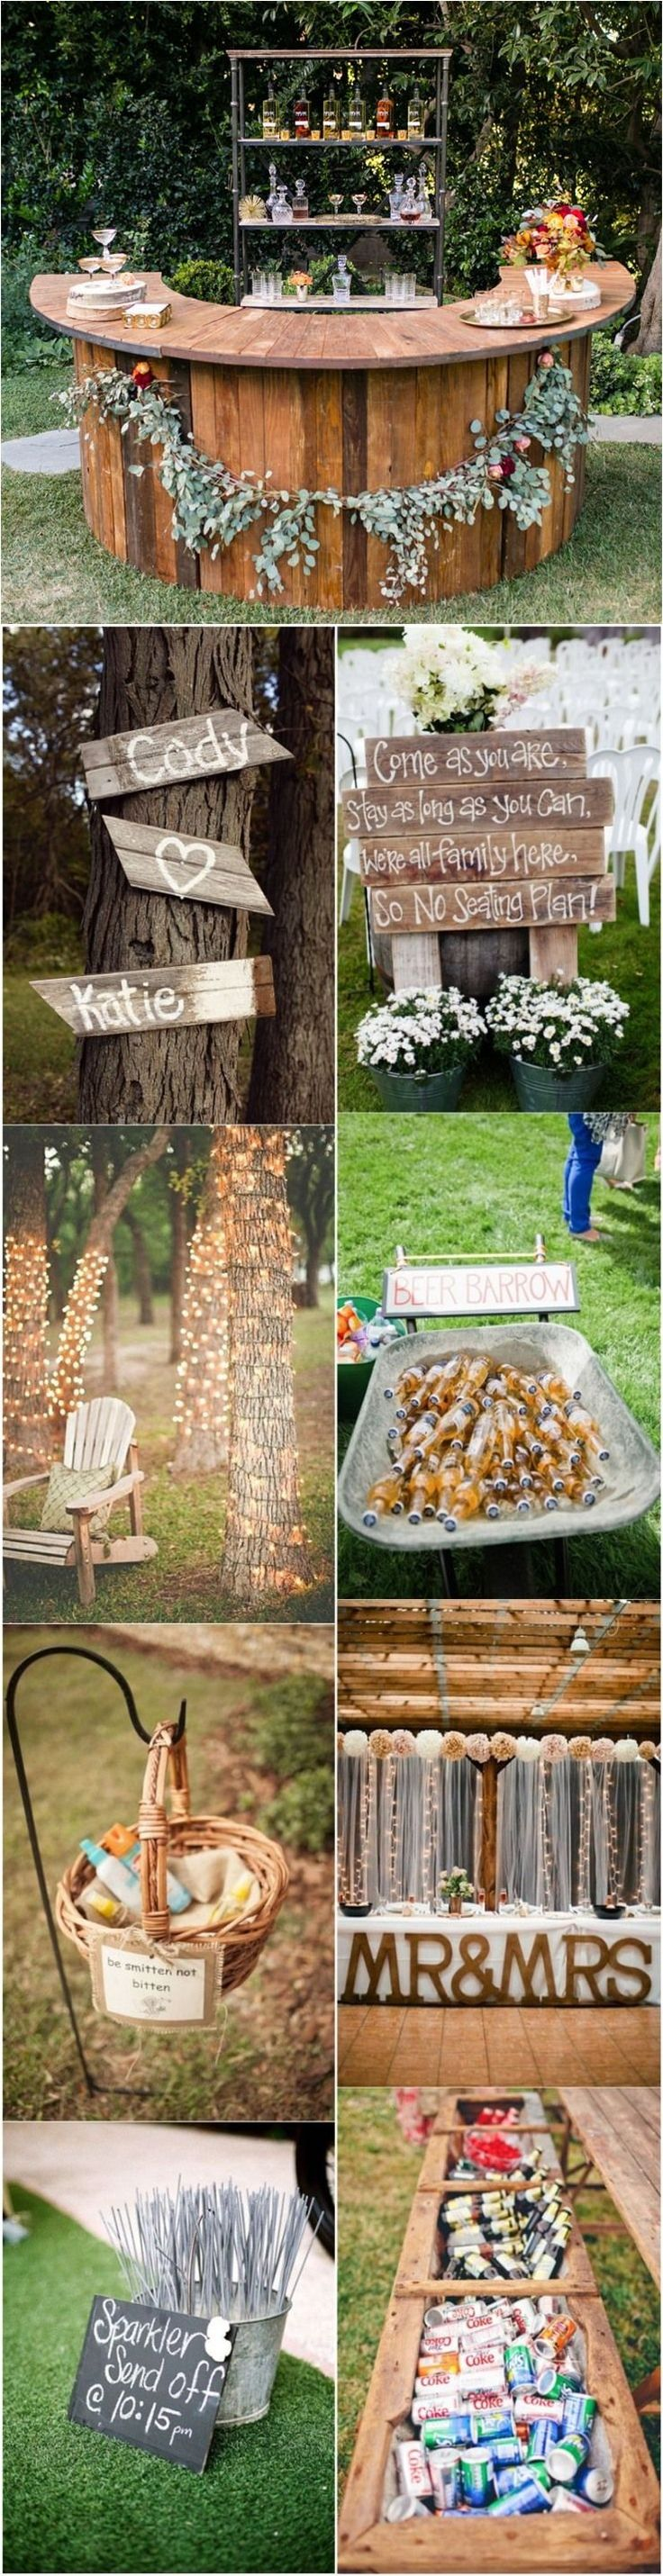 677 best Outdoor Weddings Ideas images on Pinterest